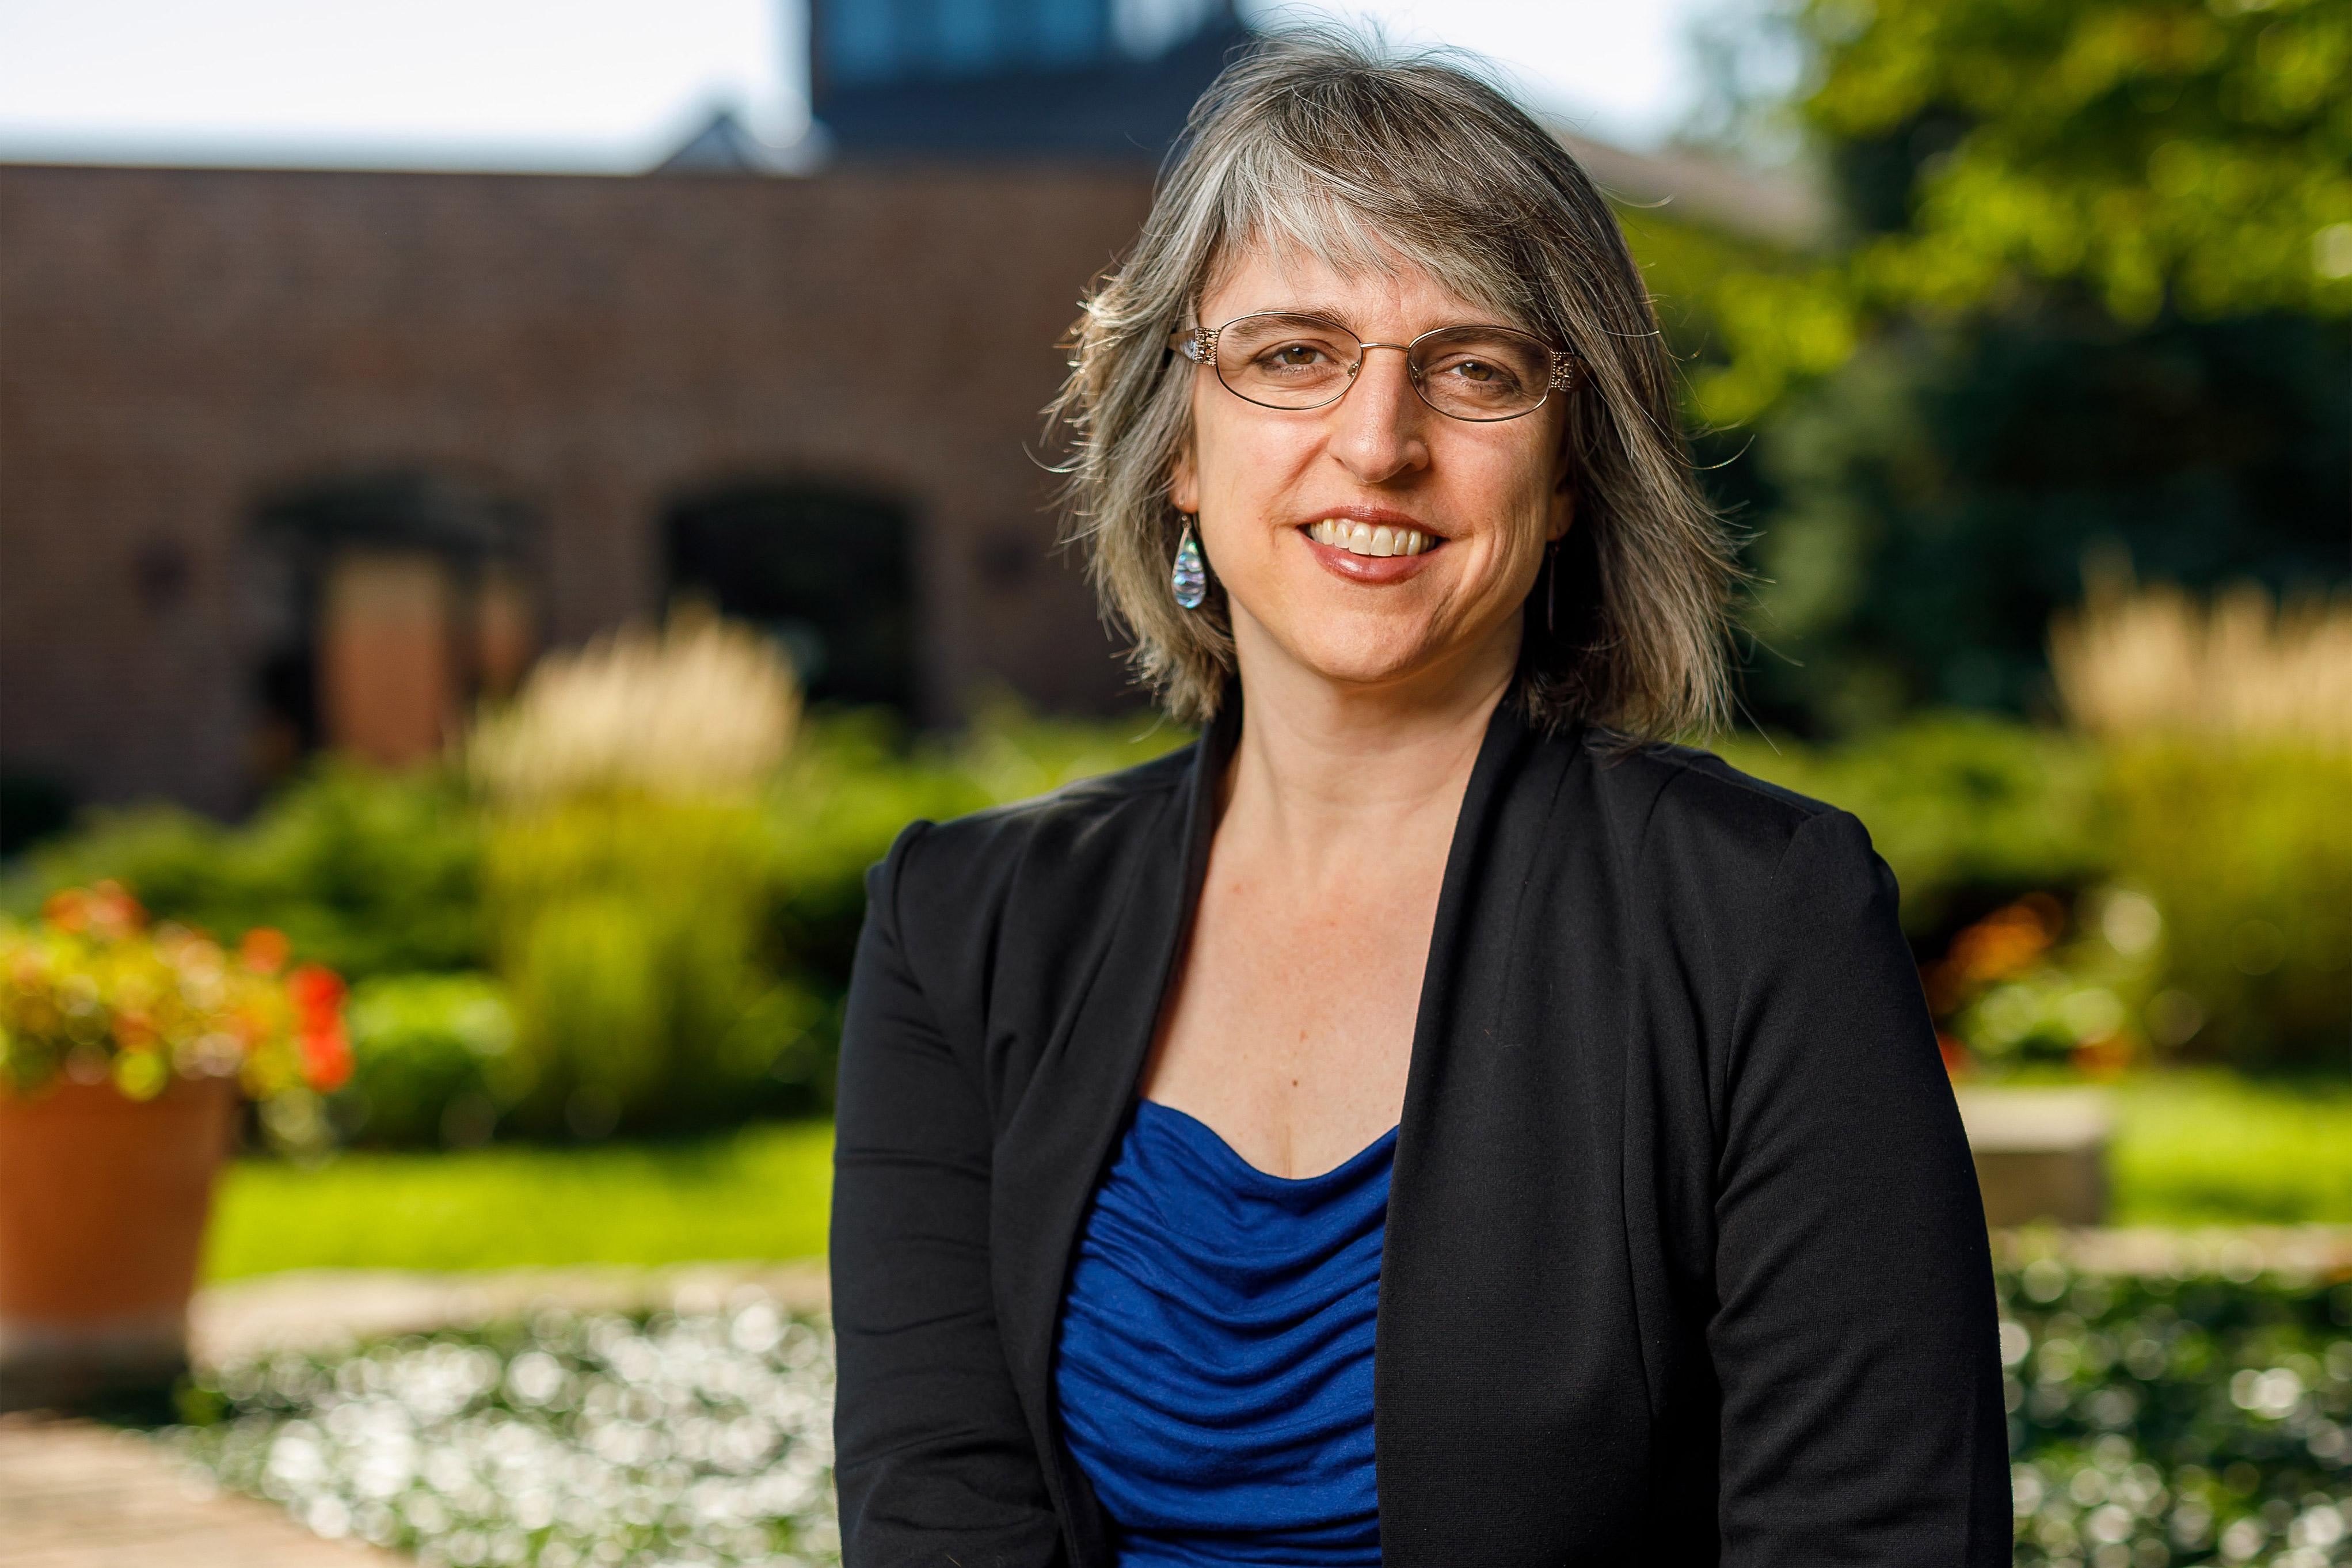 Rebecca Slough, academic dean